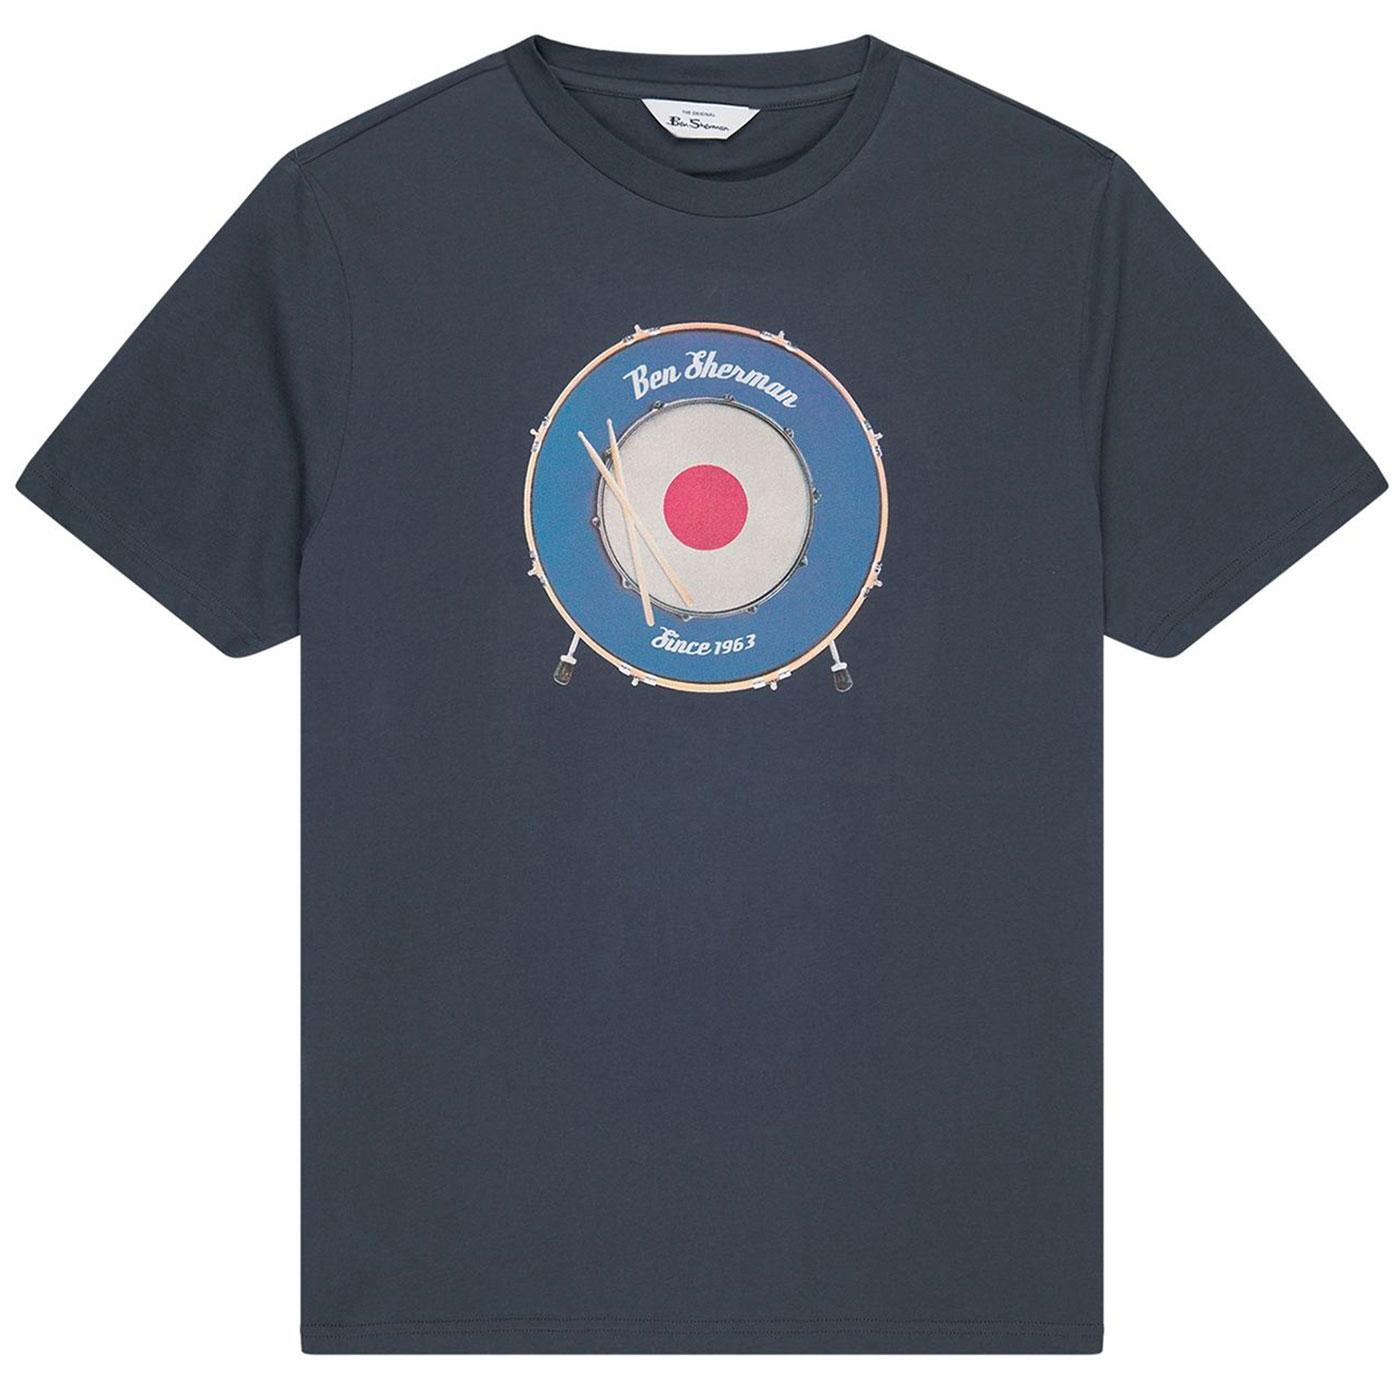 BEN SHERMAN Drum Mod Target Tee (Dark Navy)